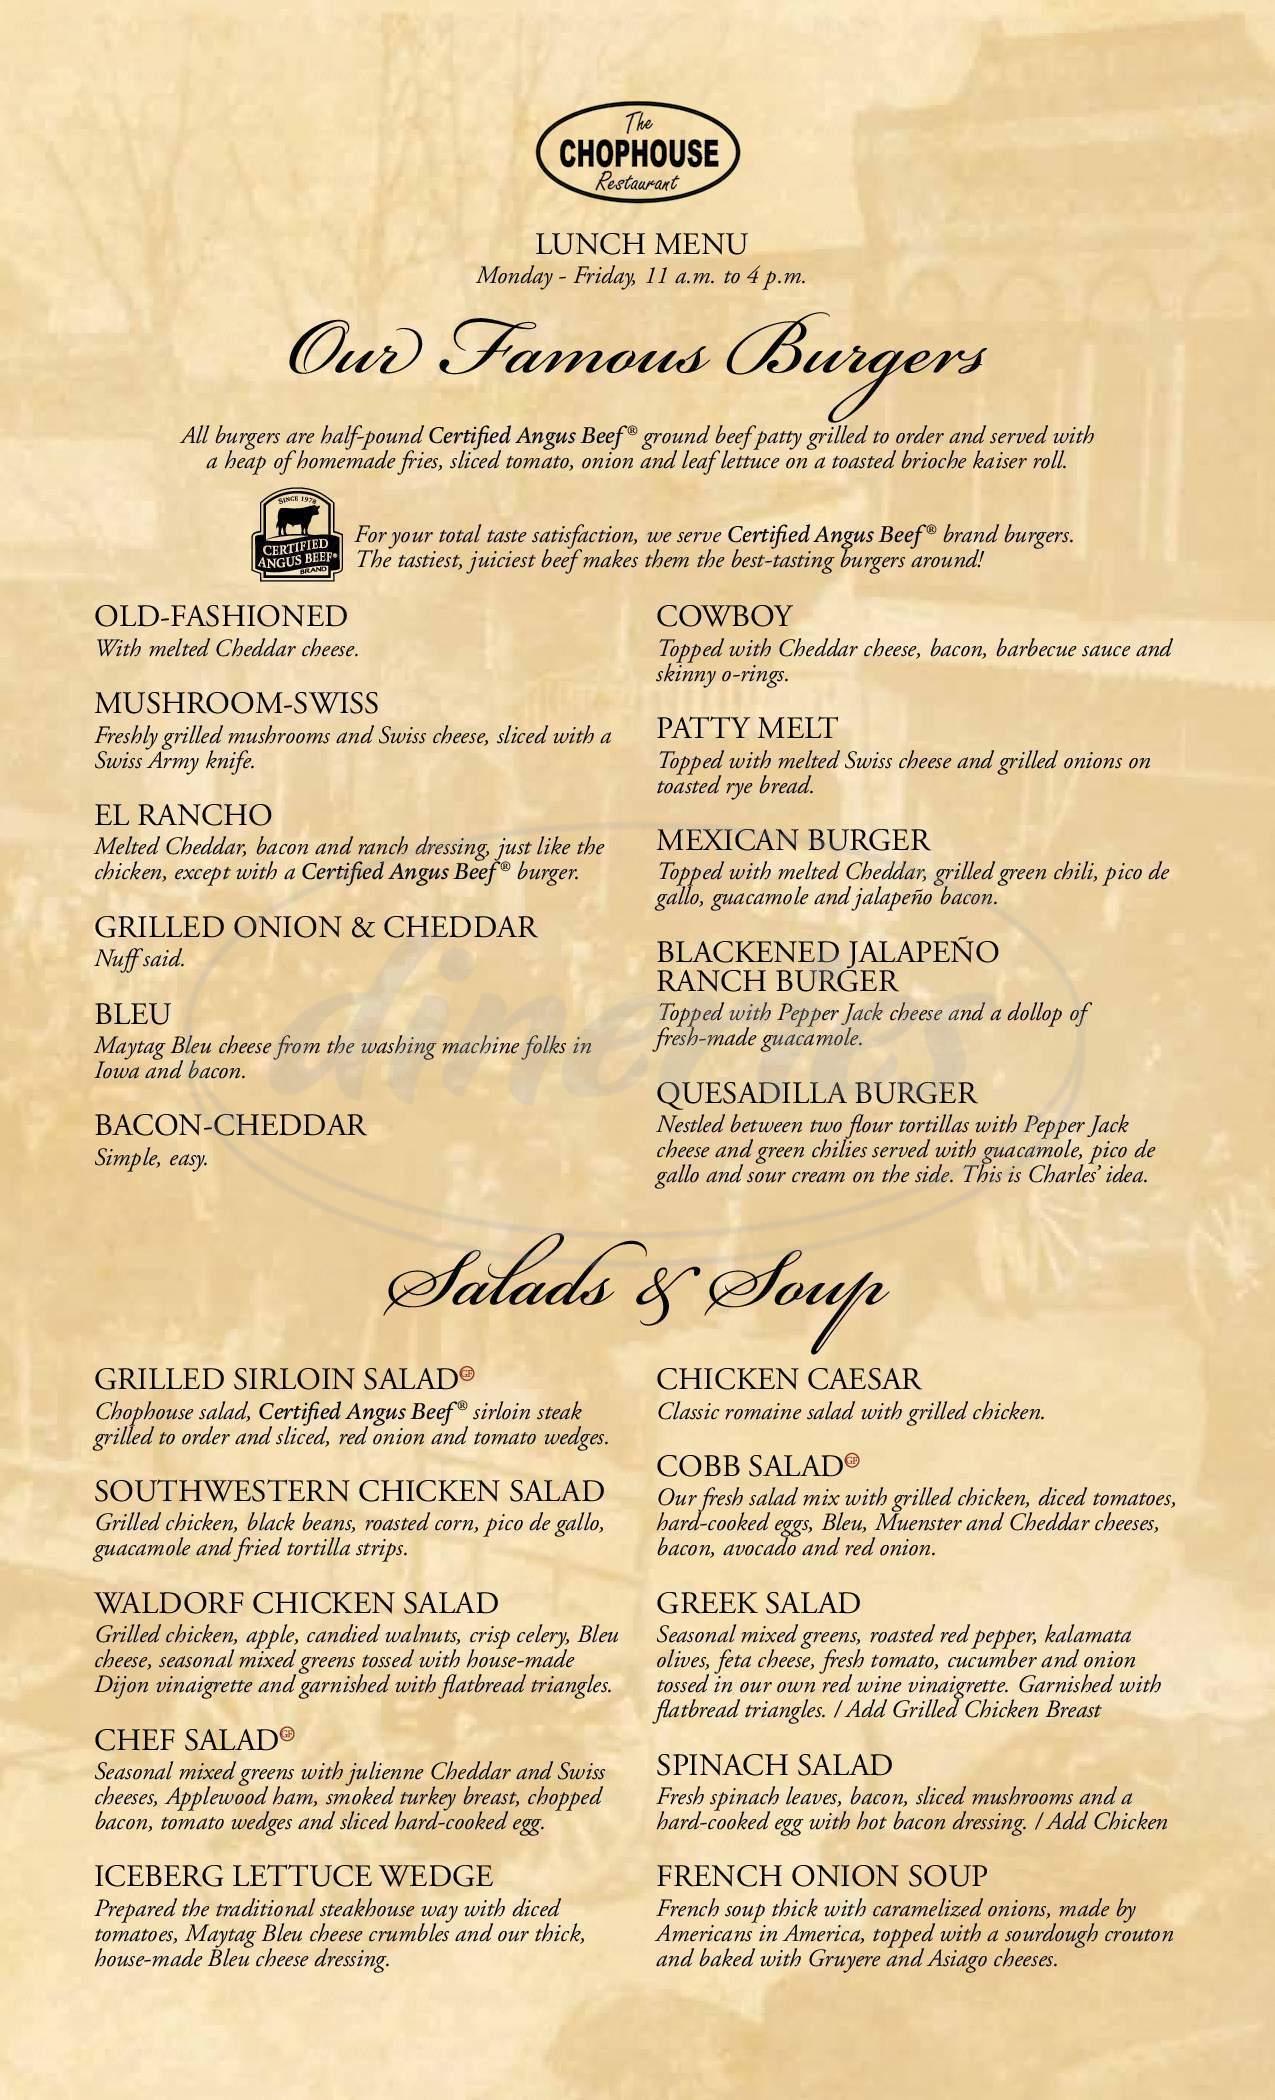 menu for The Chophouse Restaurant